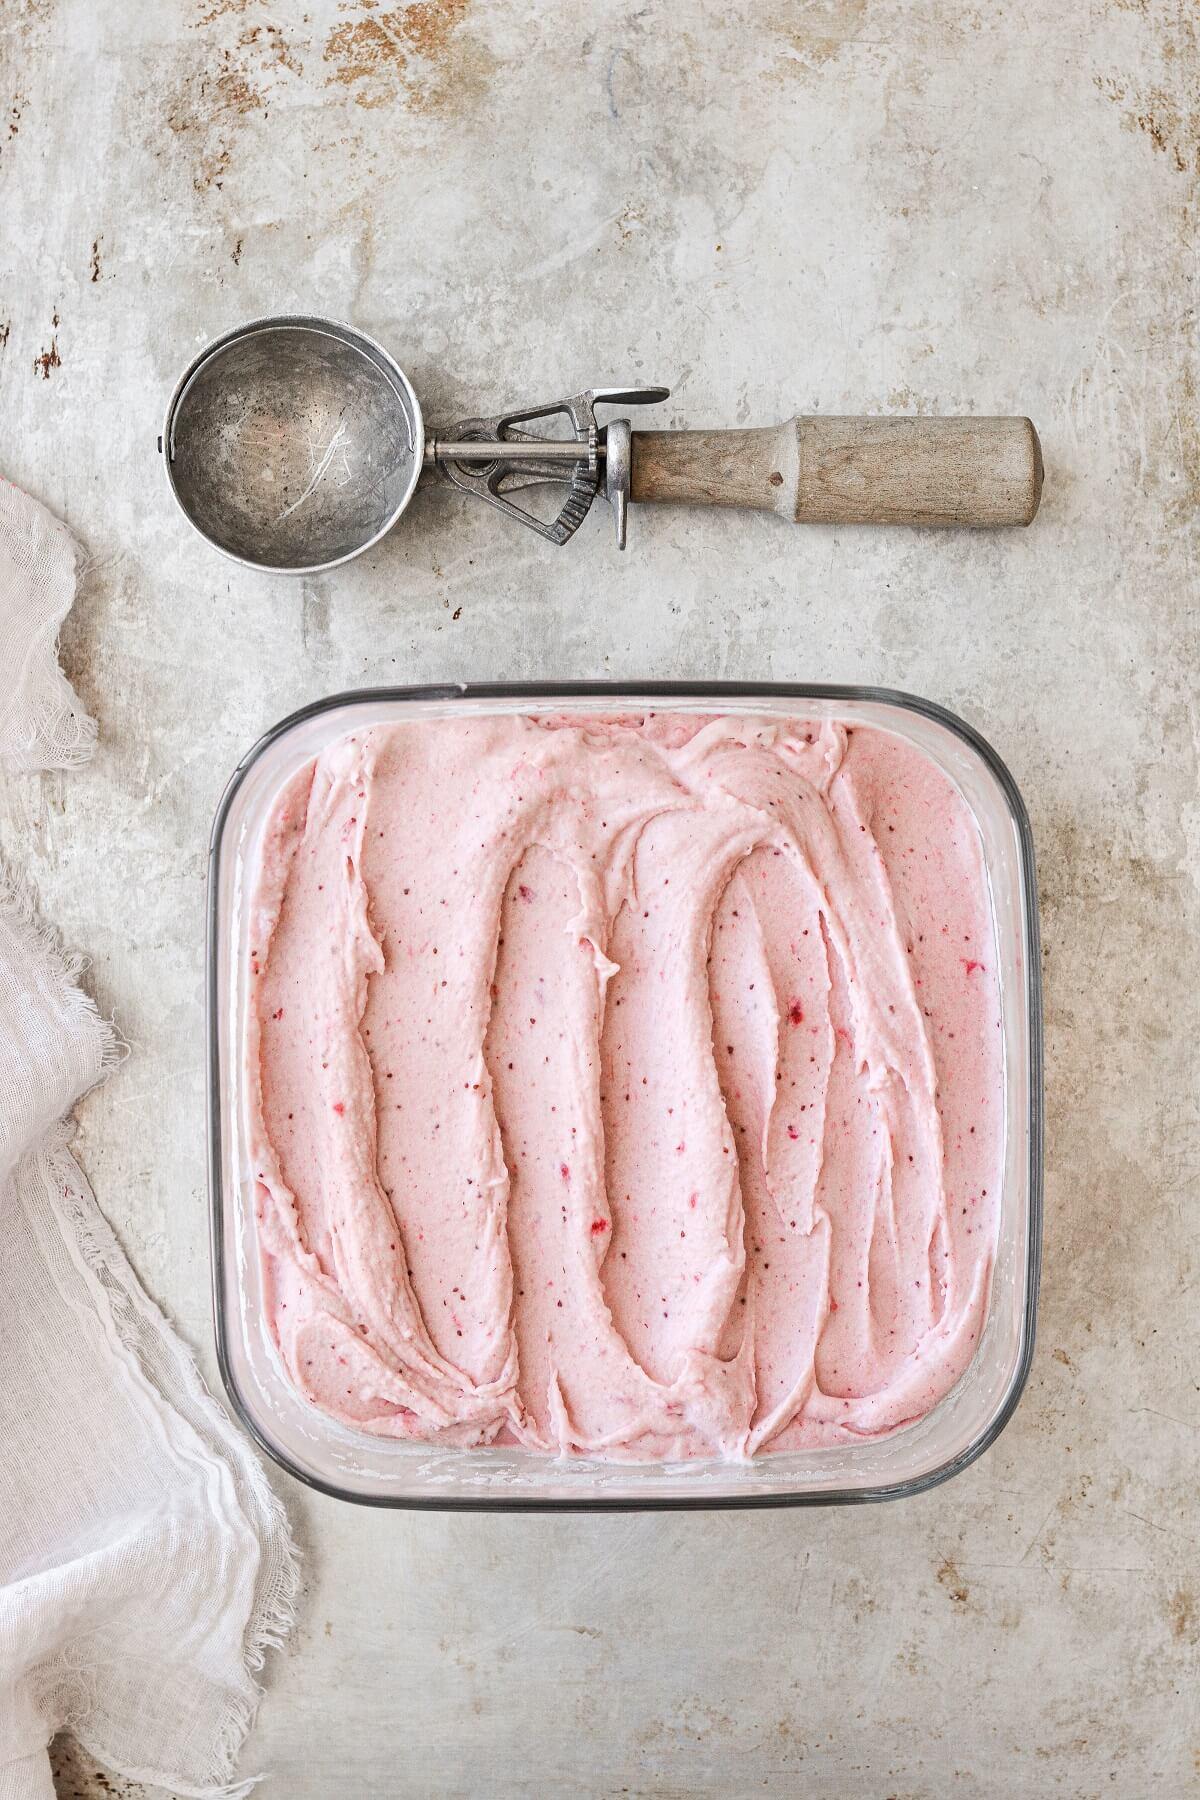 Roasted strawberry ice cream, next to a vintage ice cream scoop.